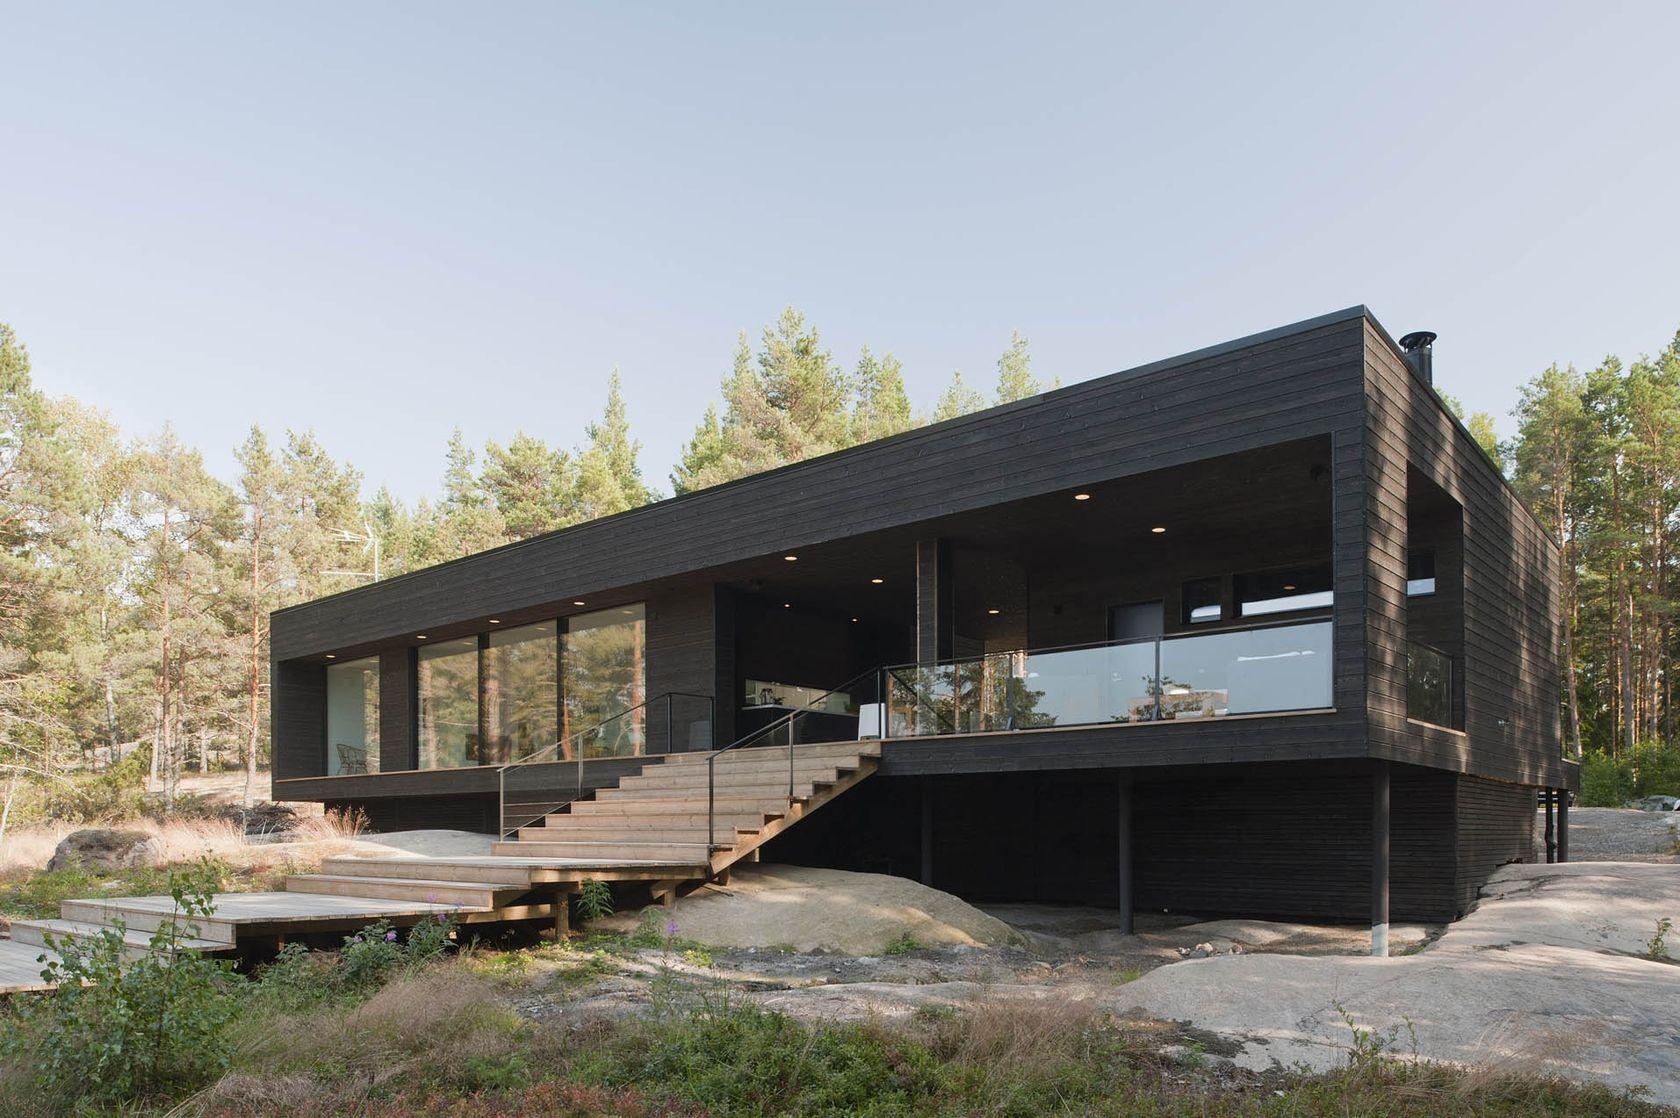 Summer Villa Vi Kustavi Province Of Western Finland